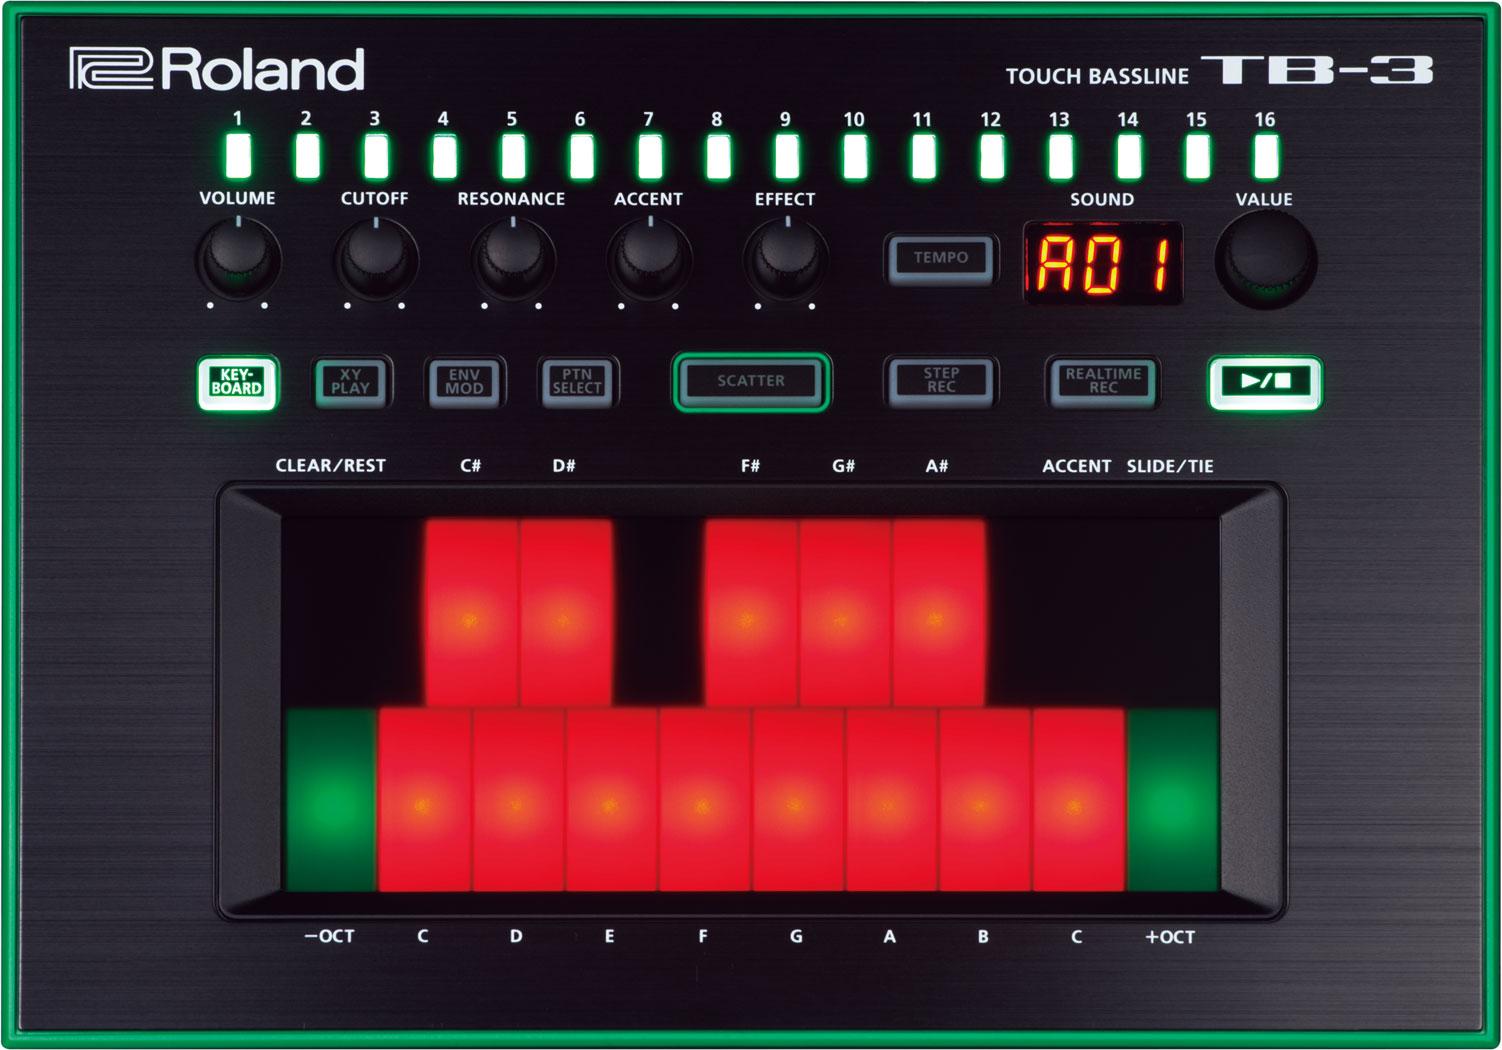 Roland Aira Tr 8 System 1 Tb 3 Vt 3 Sam Ash Music